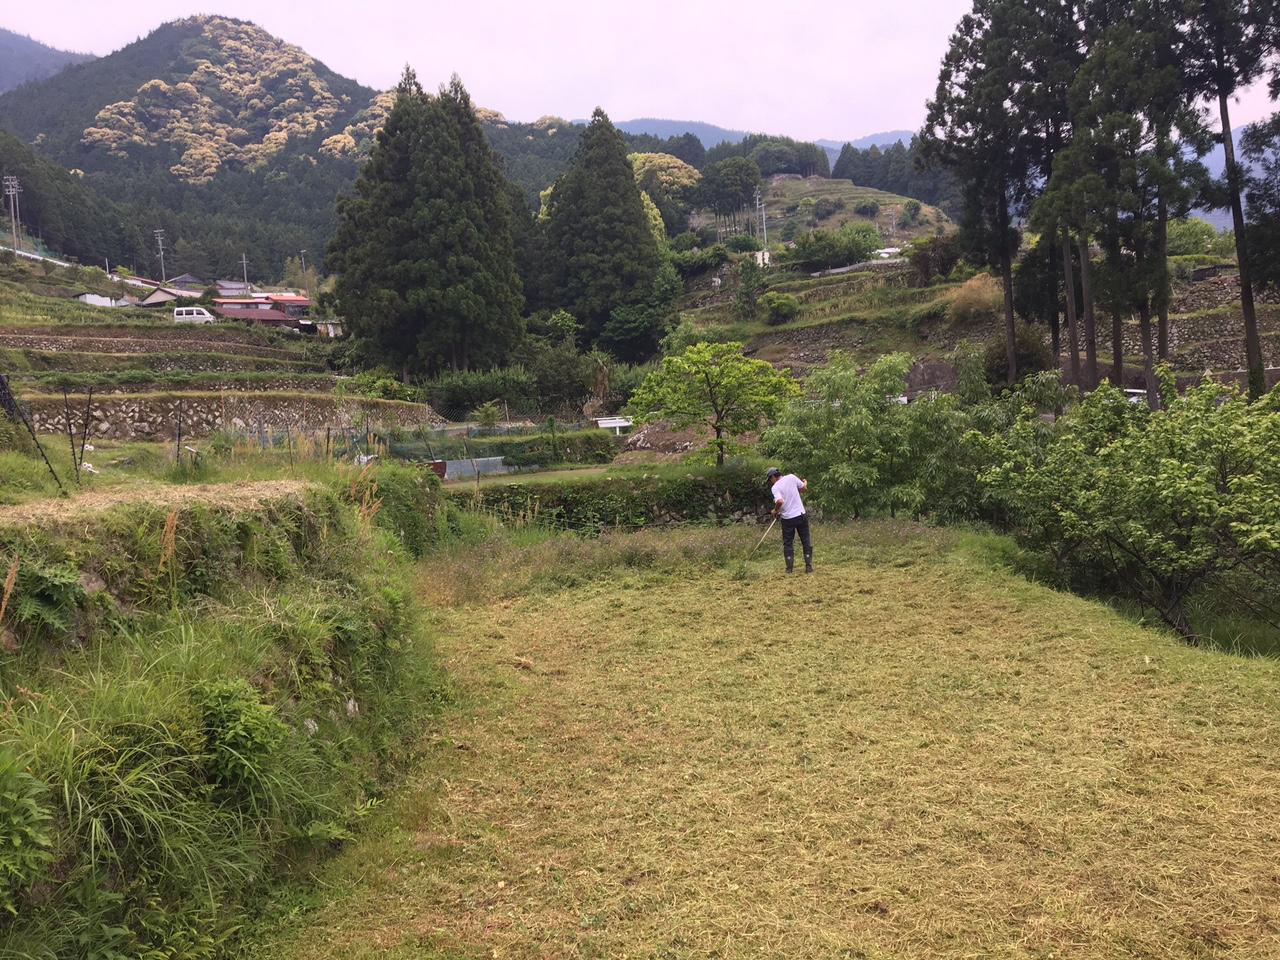 http://irokawamura.com/news/about/20170512e.jpg